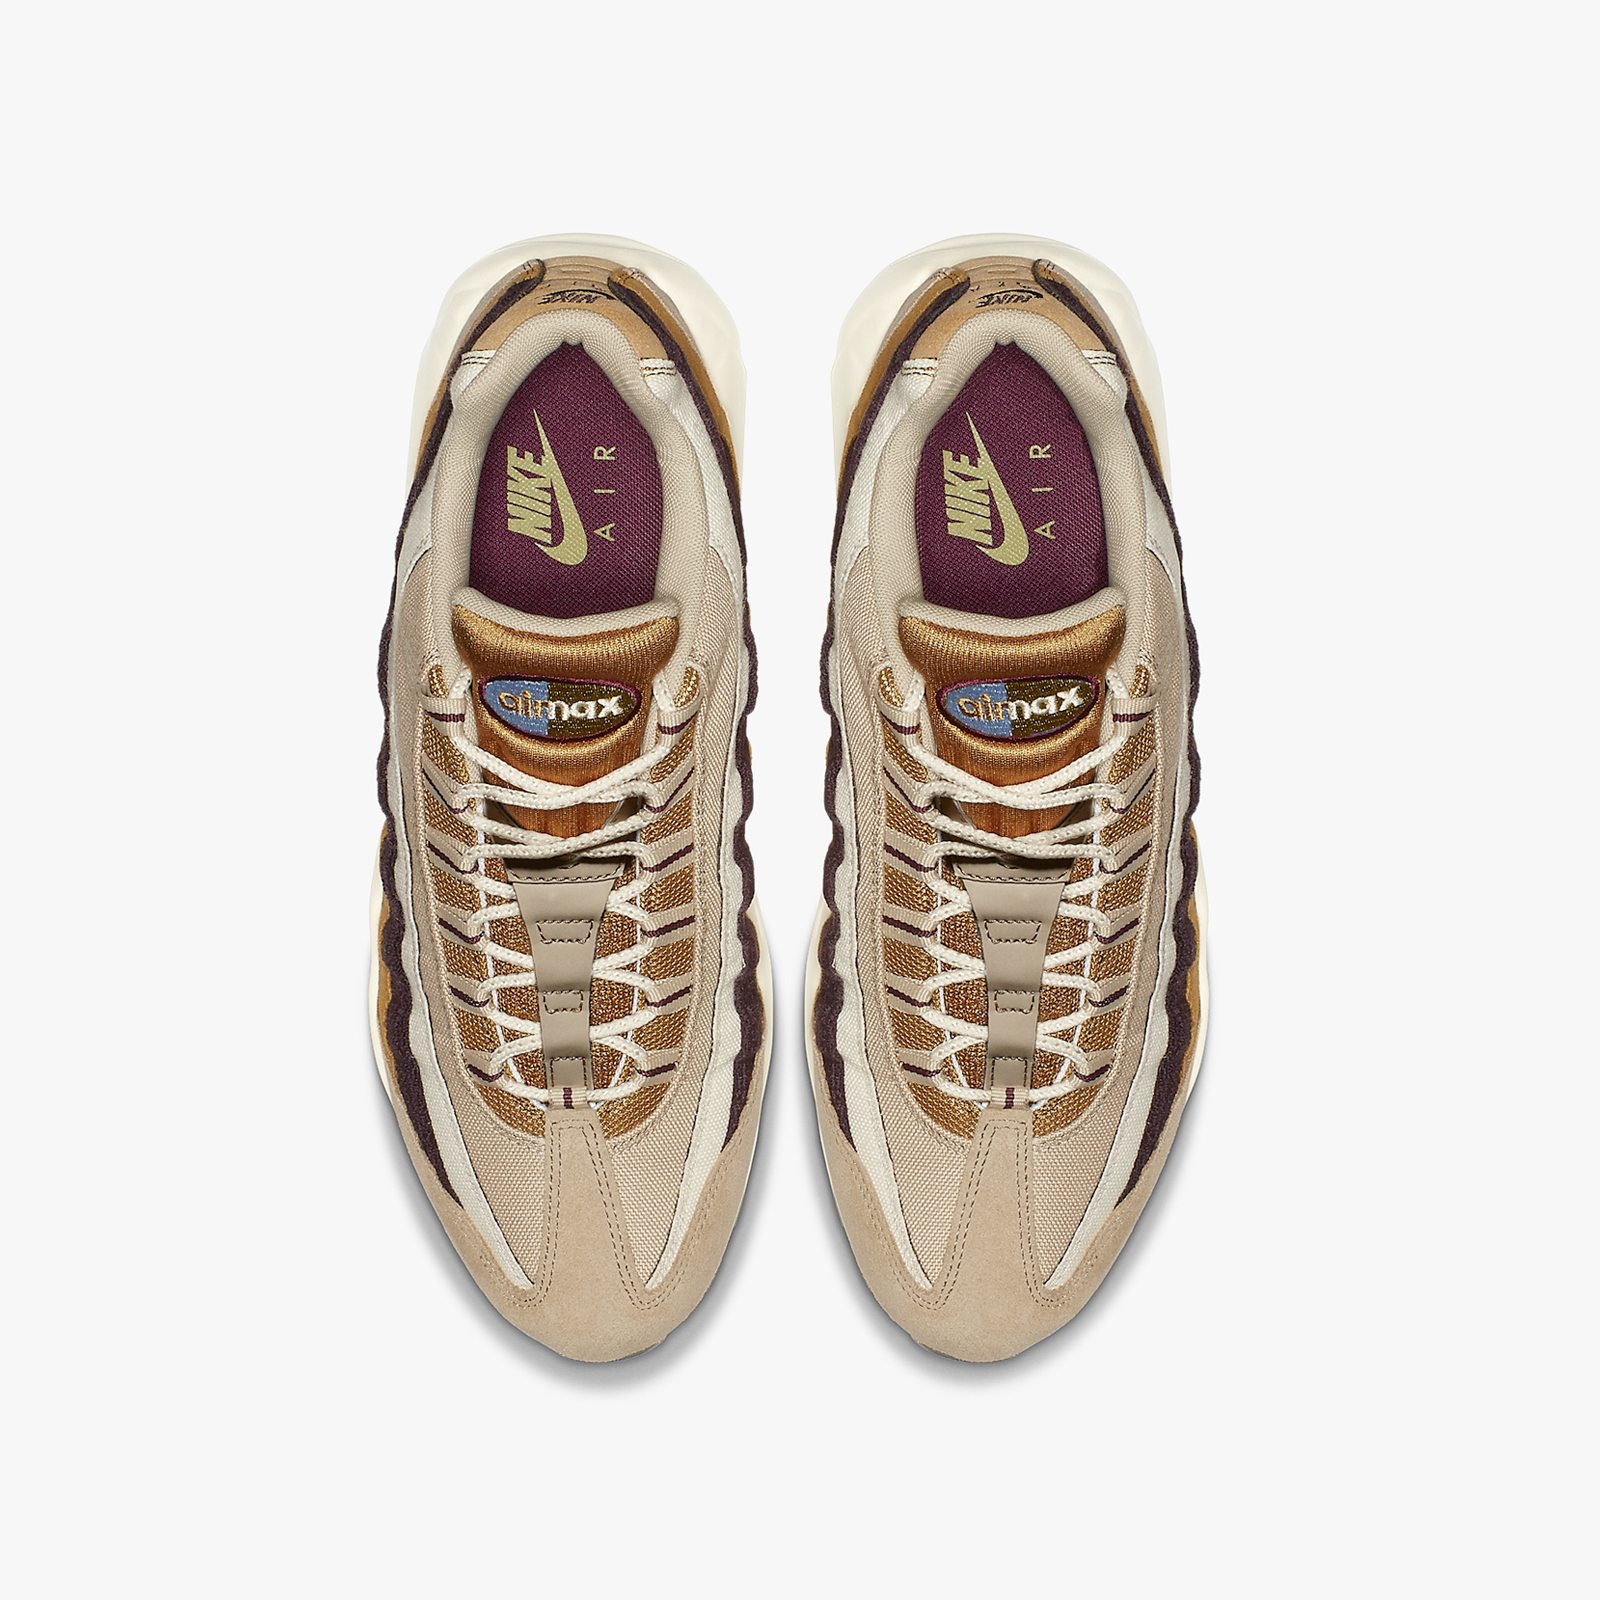 1db7e4e829 Nike Air Max 95 Premium - 538416-205 - Sneakersnstuff | sneakers ...